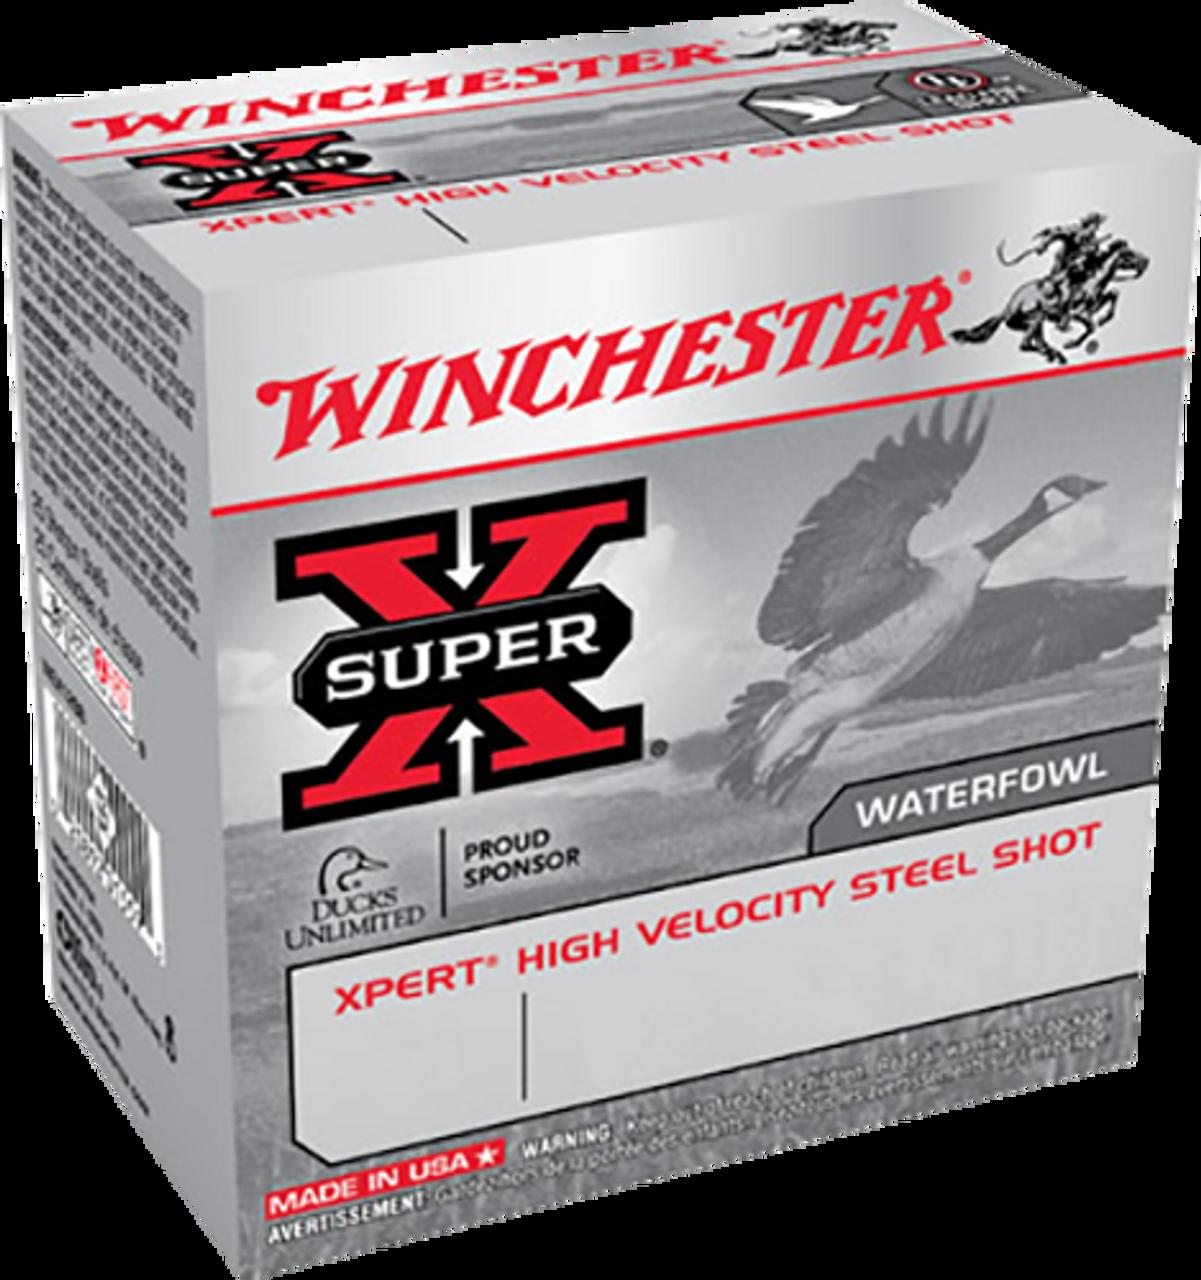 Winchester Ammo Super X, Win Wex12h3   Xpert     11/8 Stl     25/10